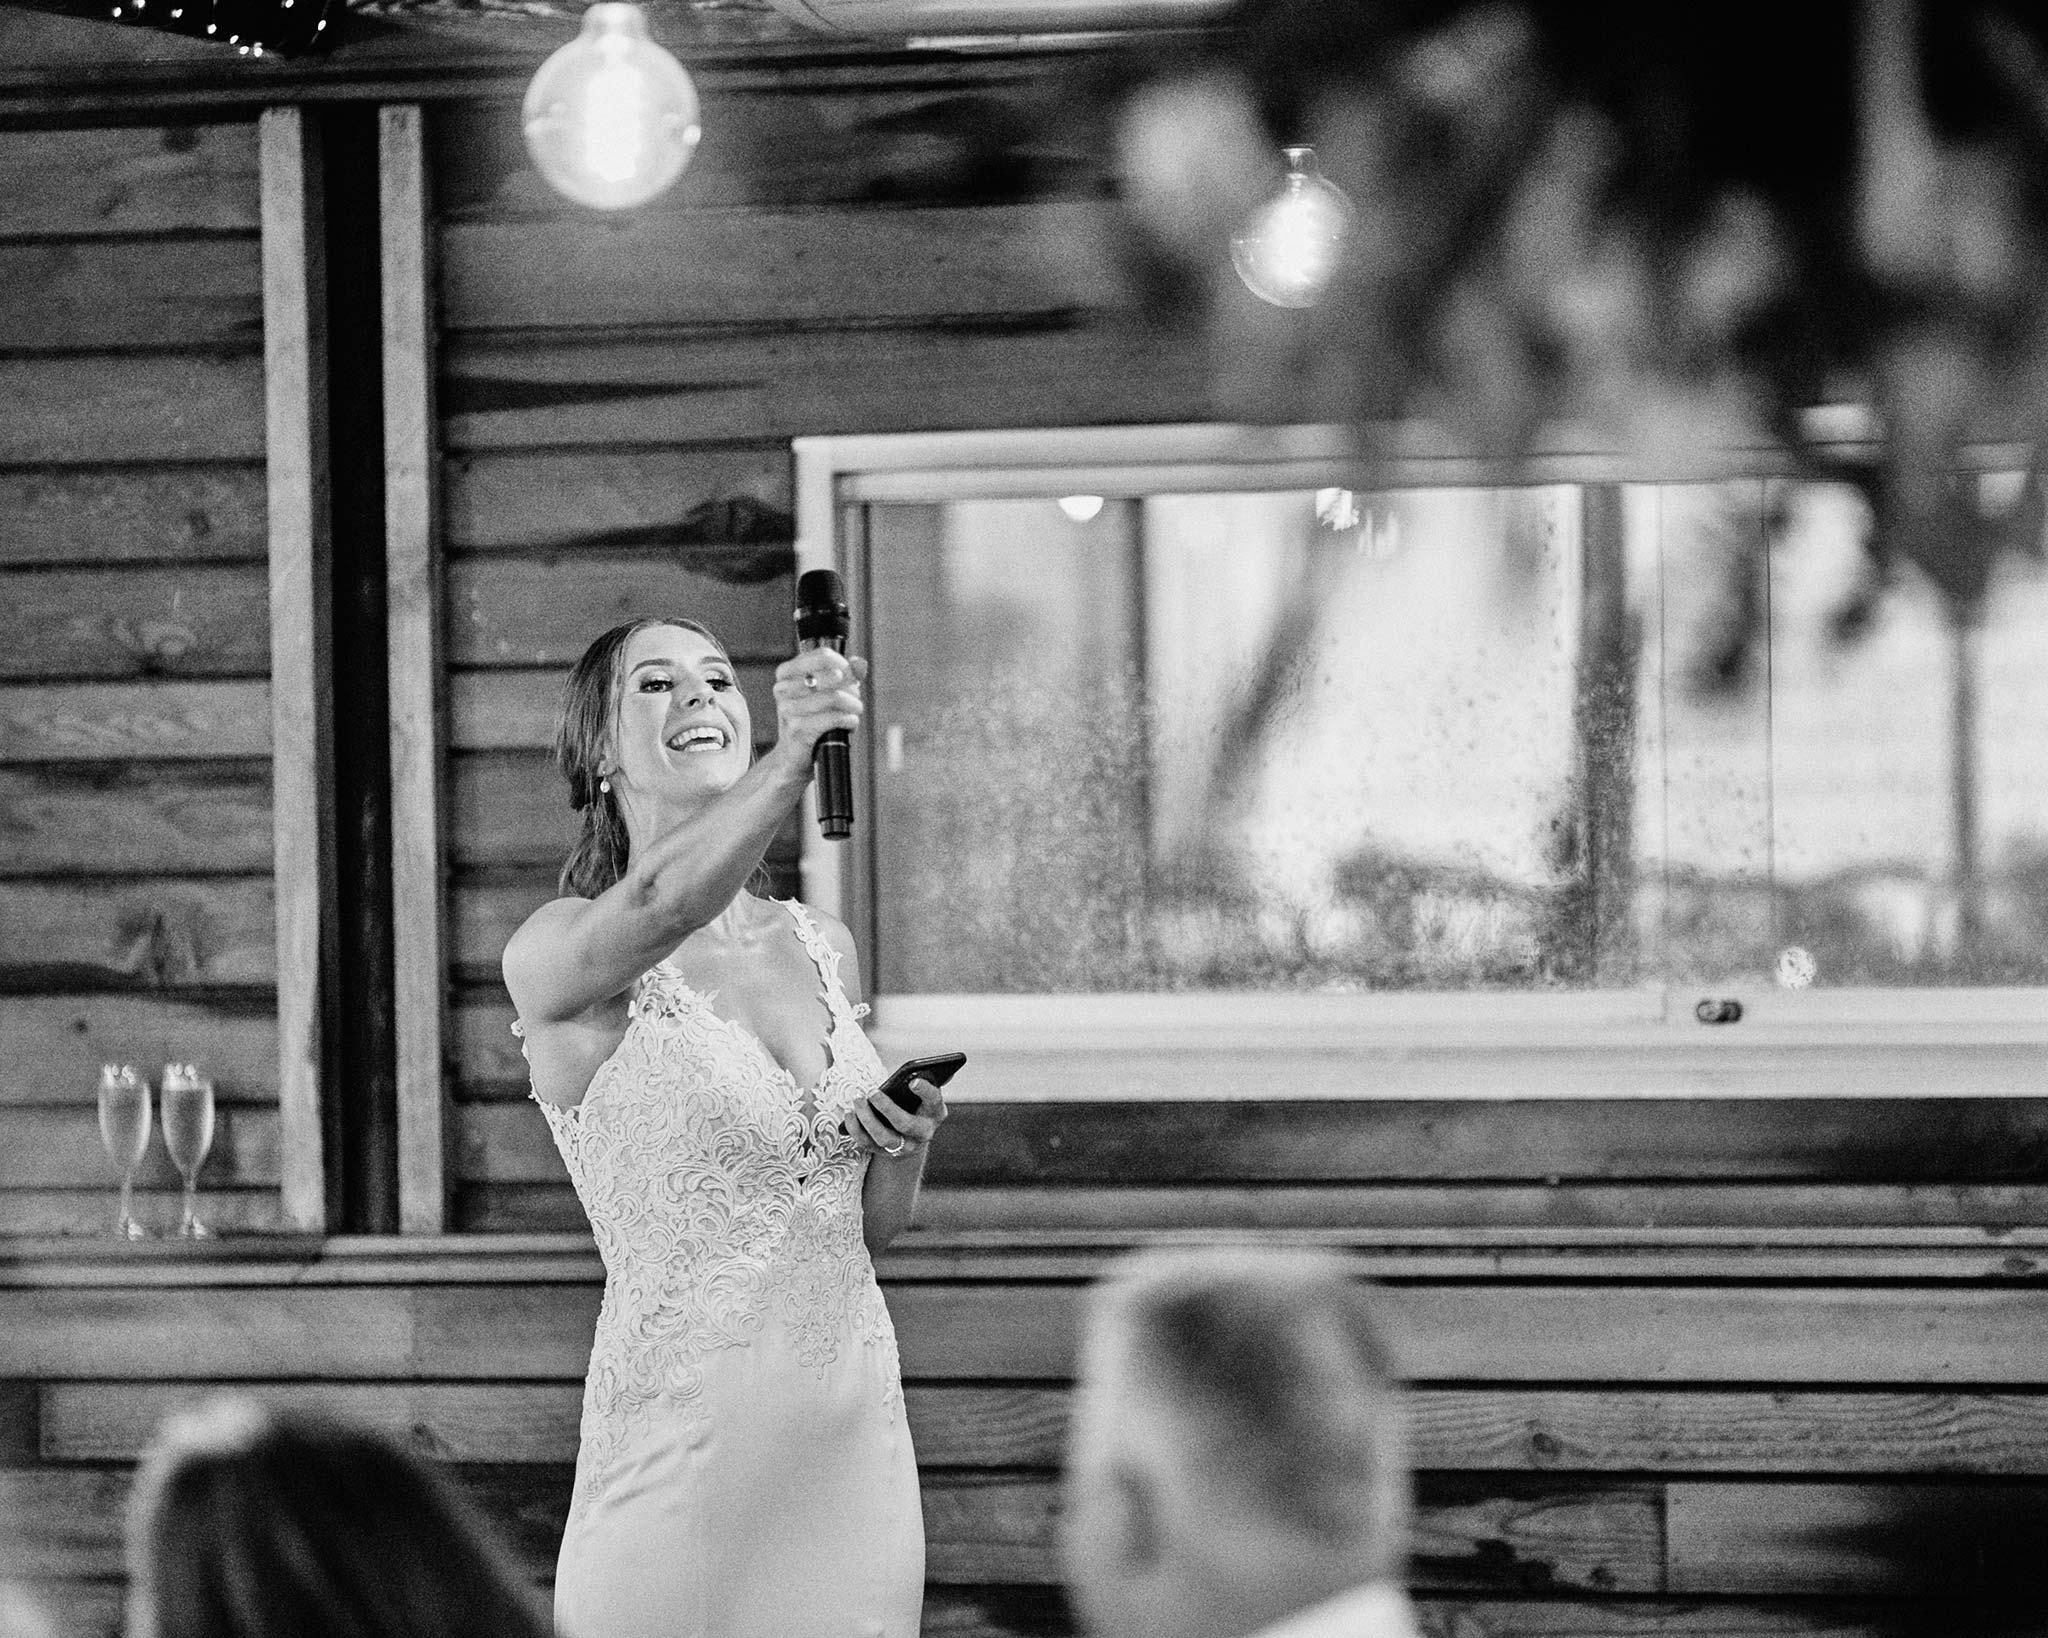 zonzo wedding photography reception bride speech